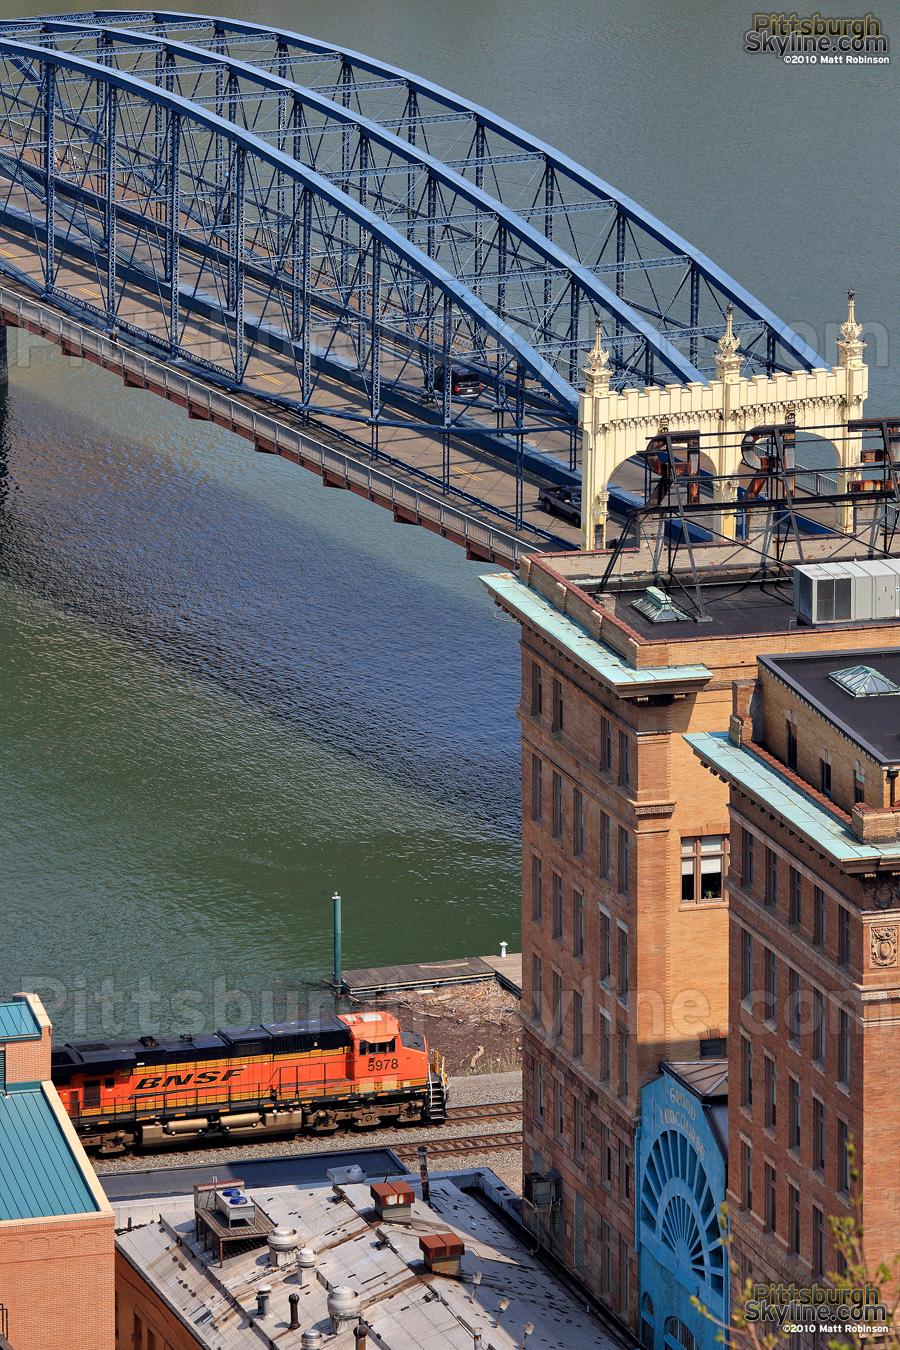 Smithfield Street Bridge and BNSF Locomotive